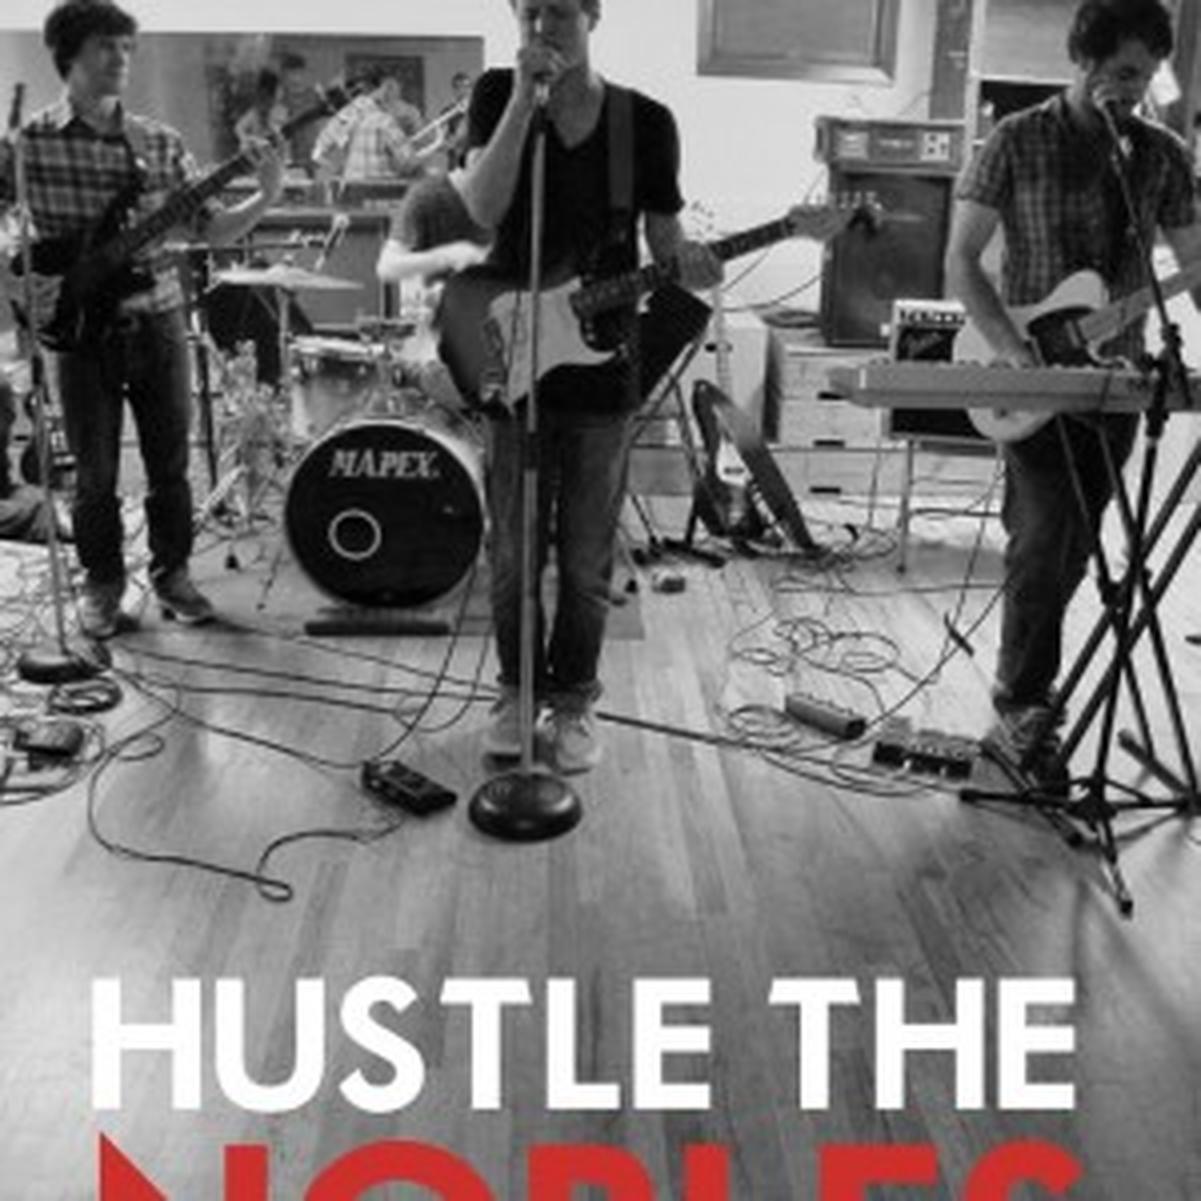 Hustle the Nobles